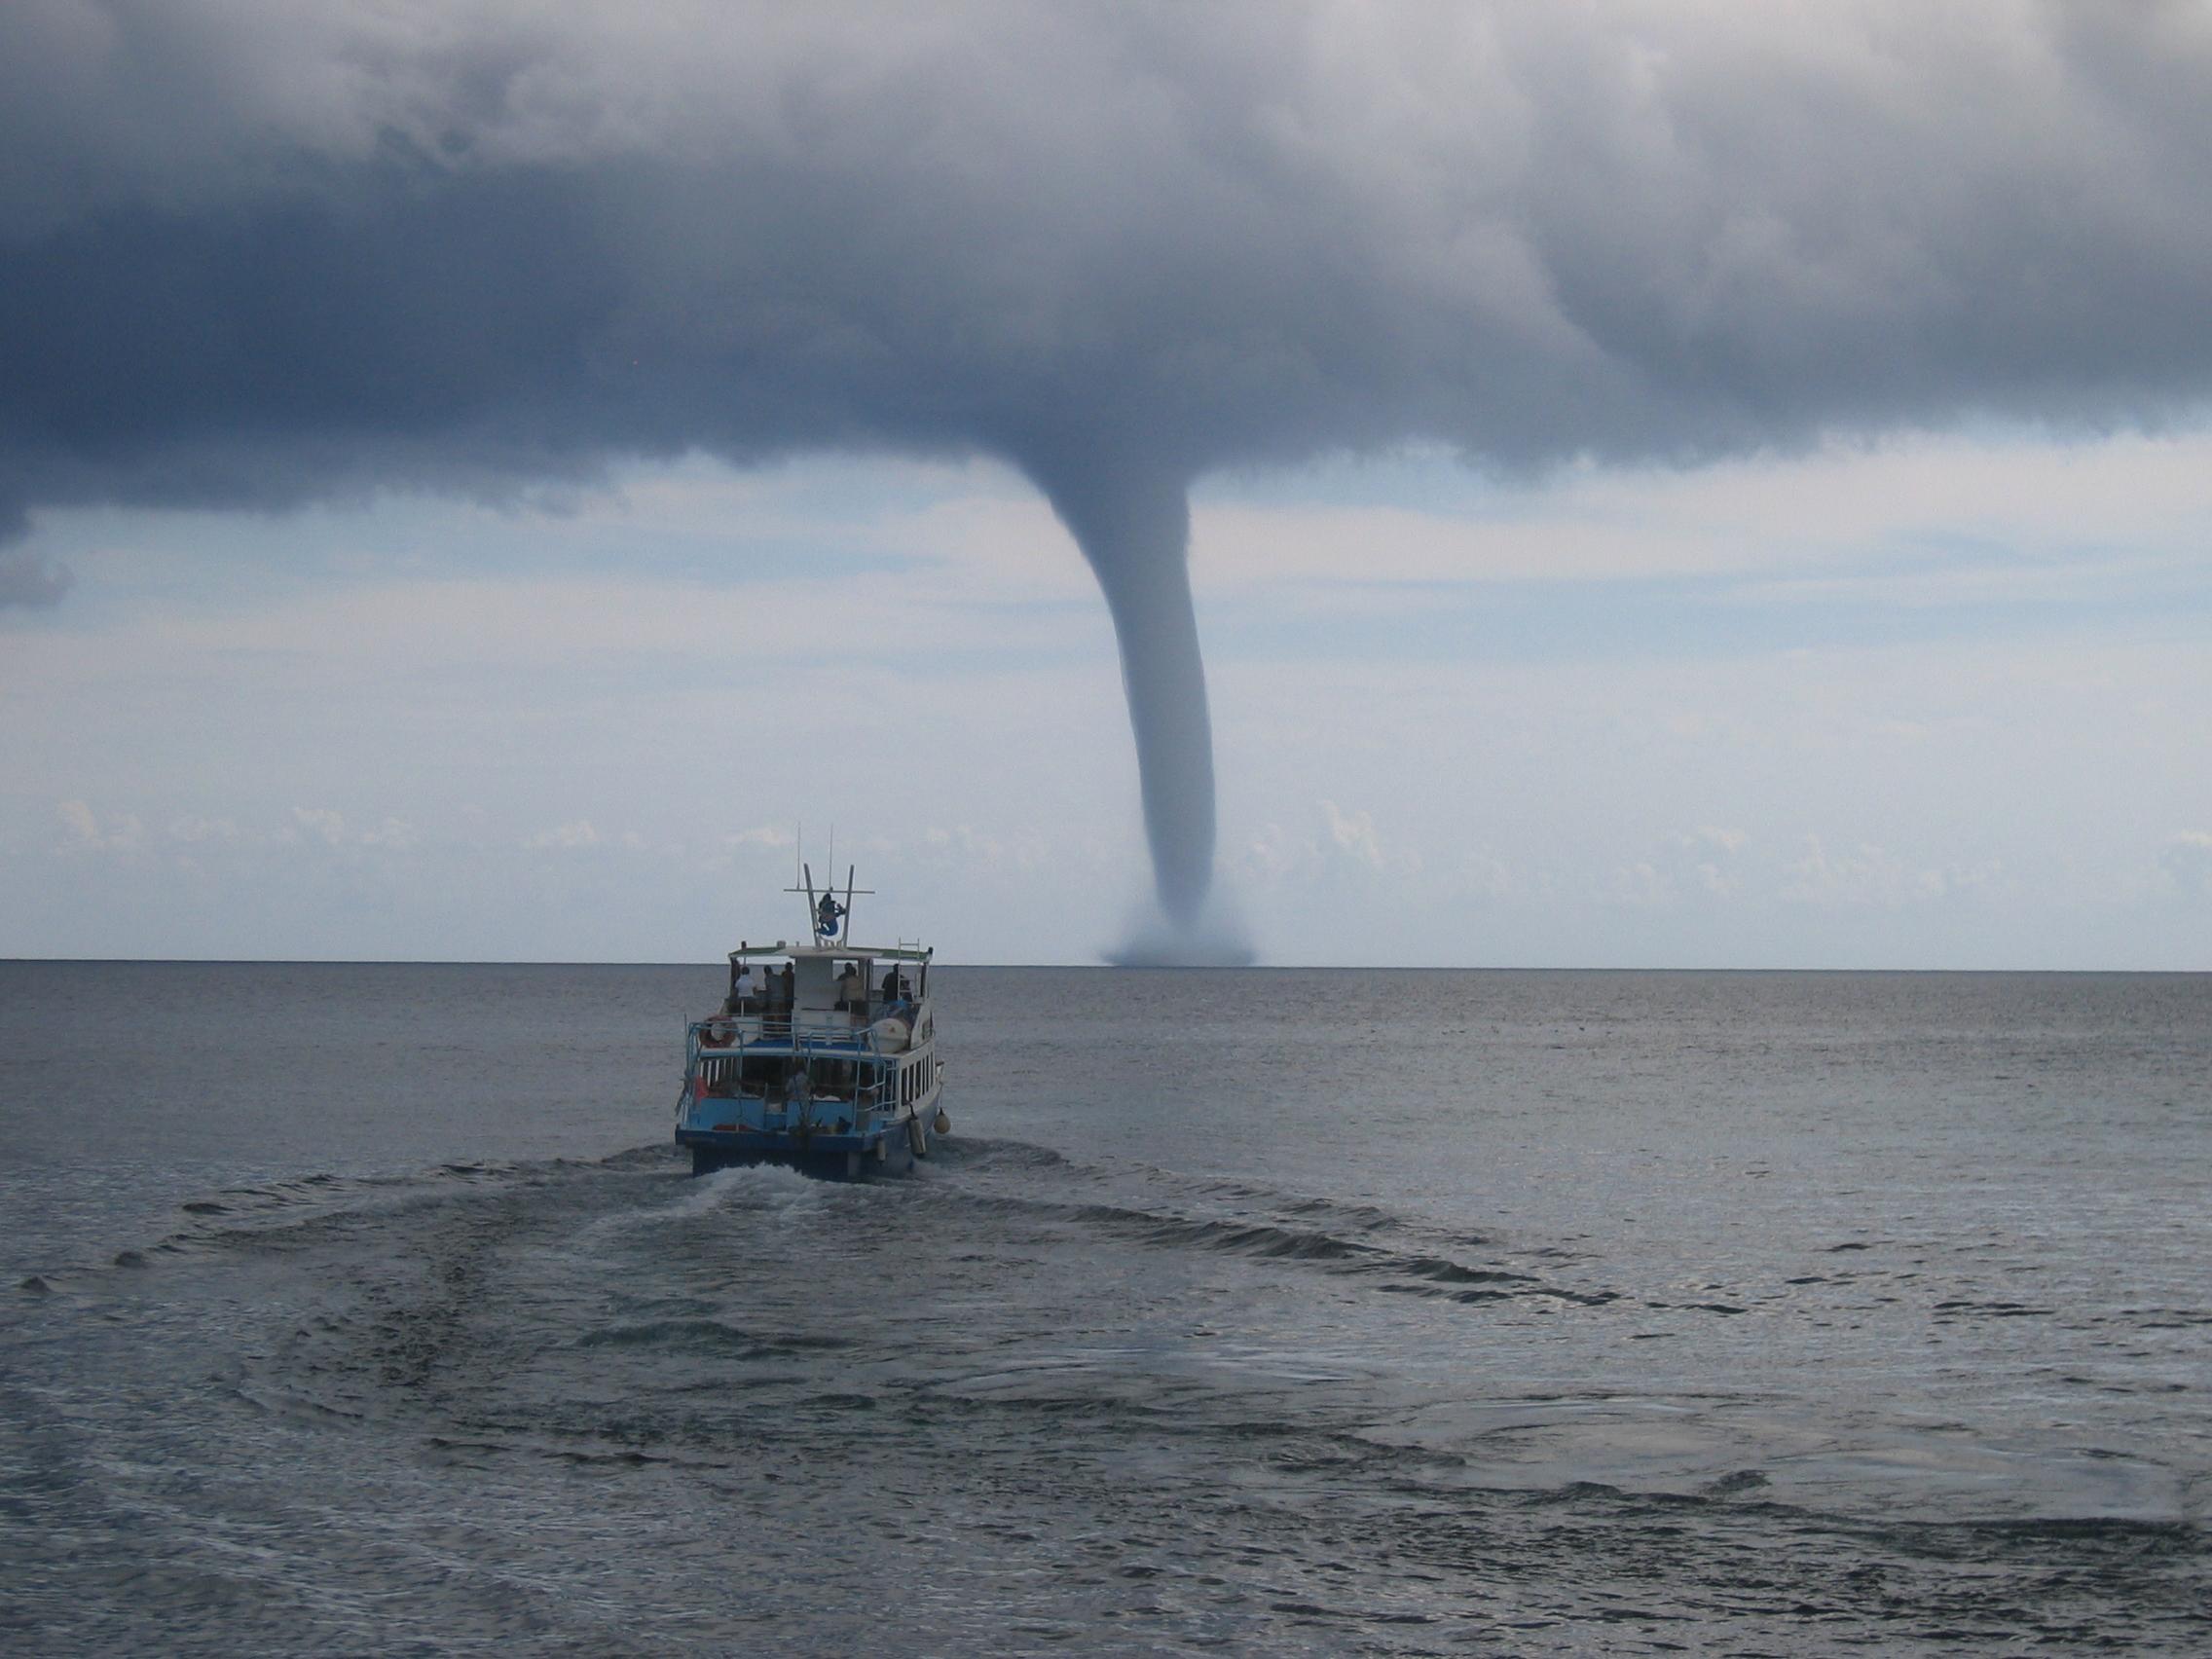 Файл:Tornado near Cala Ratjada (Mallorca) 11.09.05.jpg — Википедия